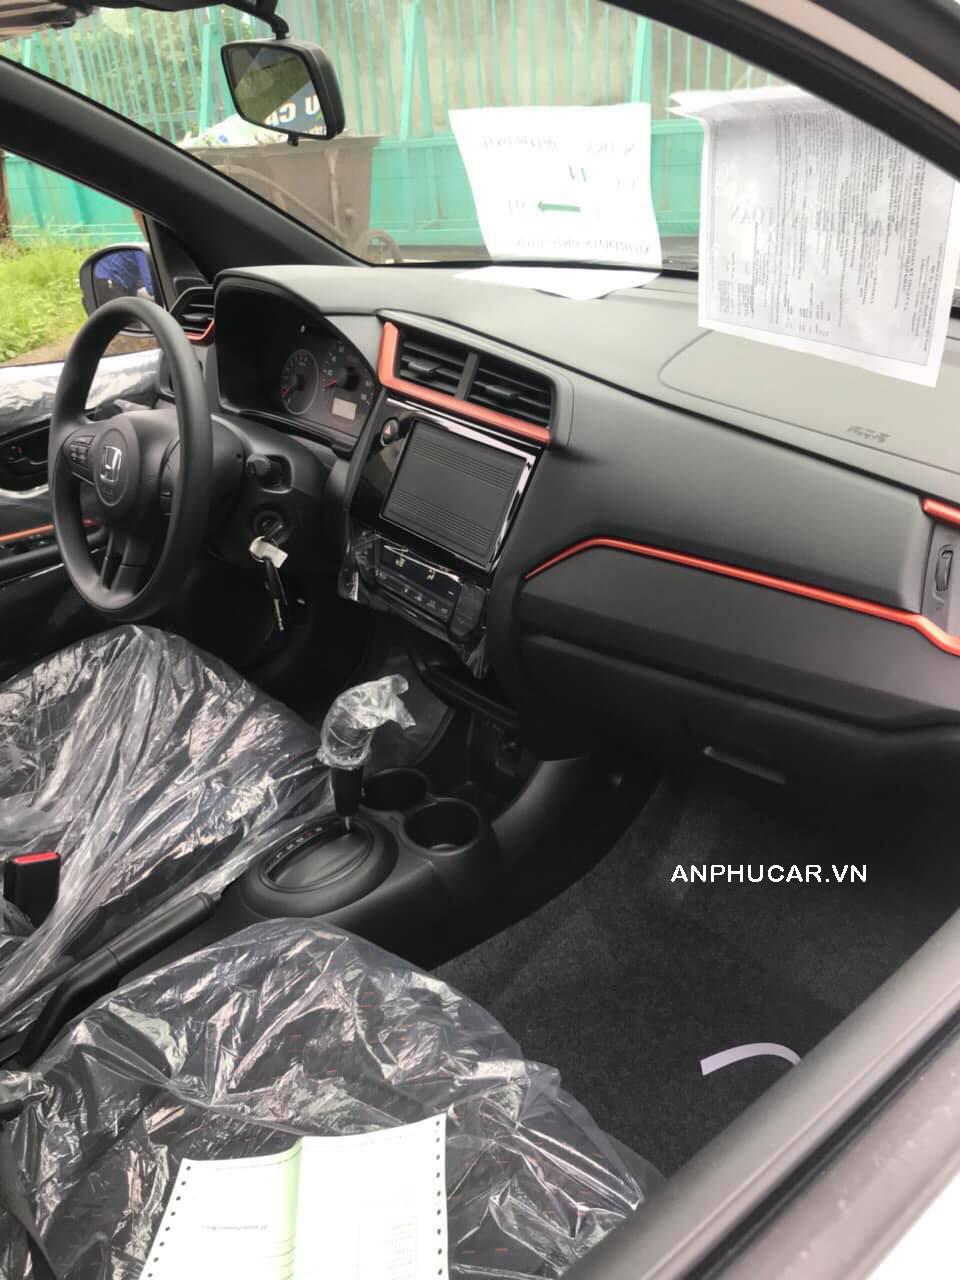 Nội thất xe Honda Brio 2020